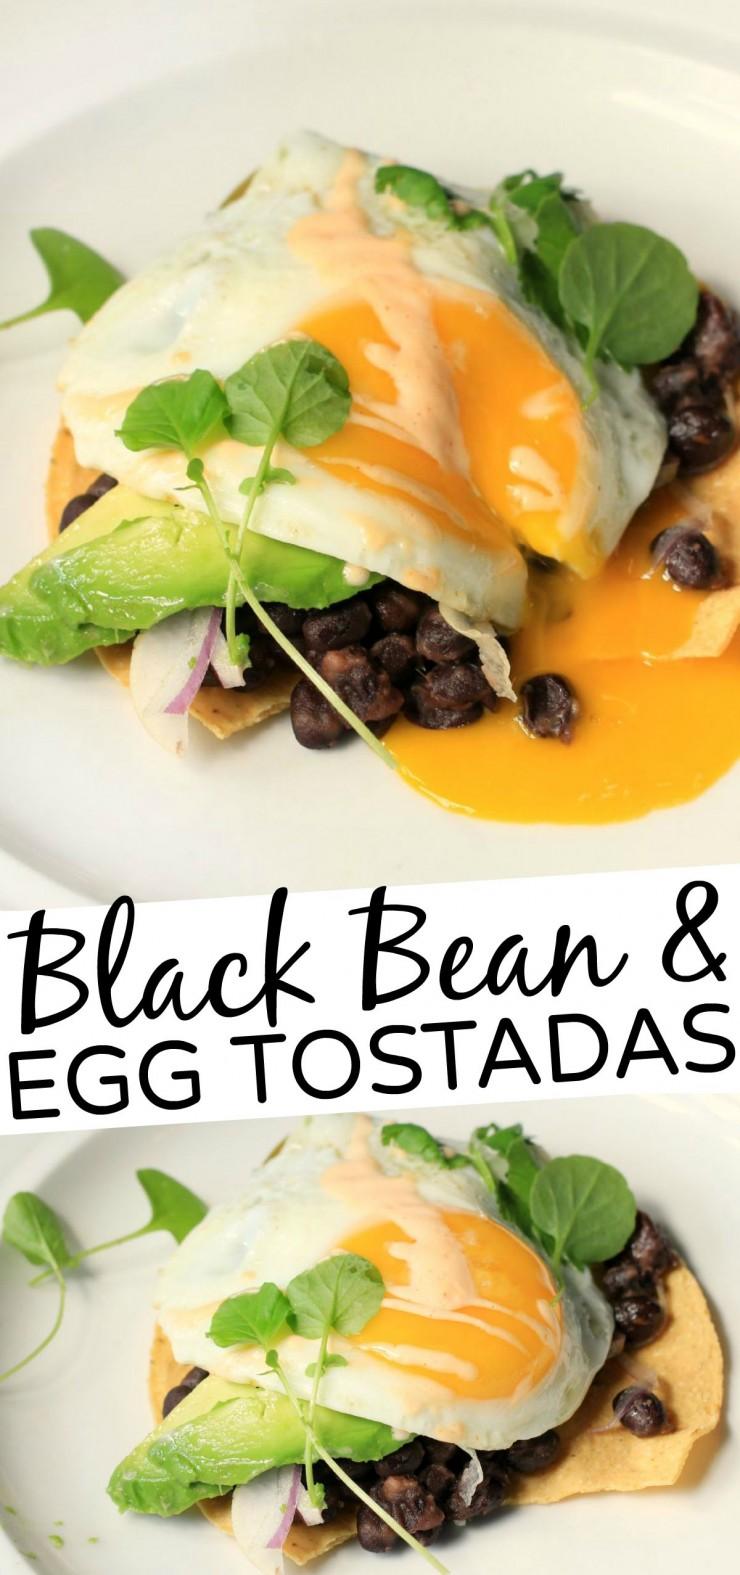 Black Bean and Egg Tostadas